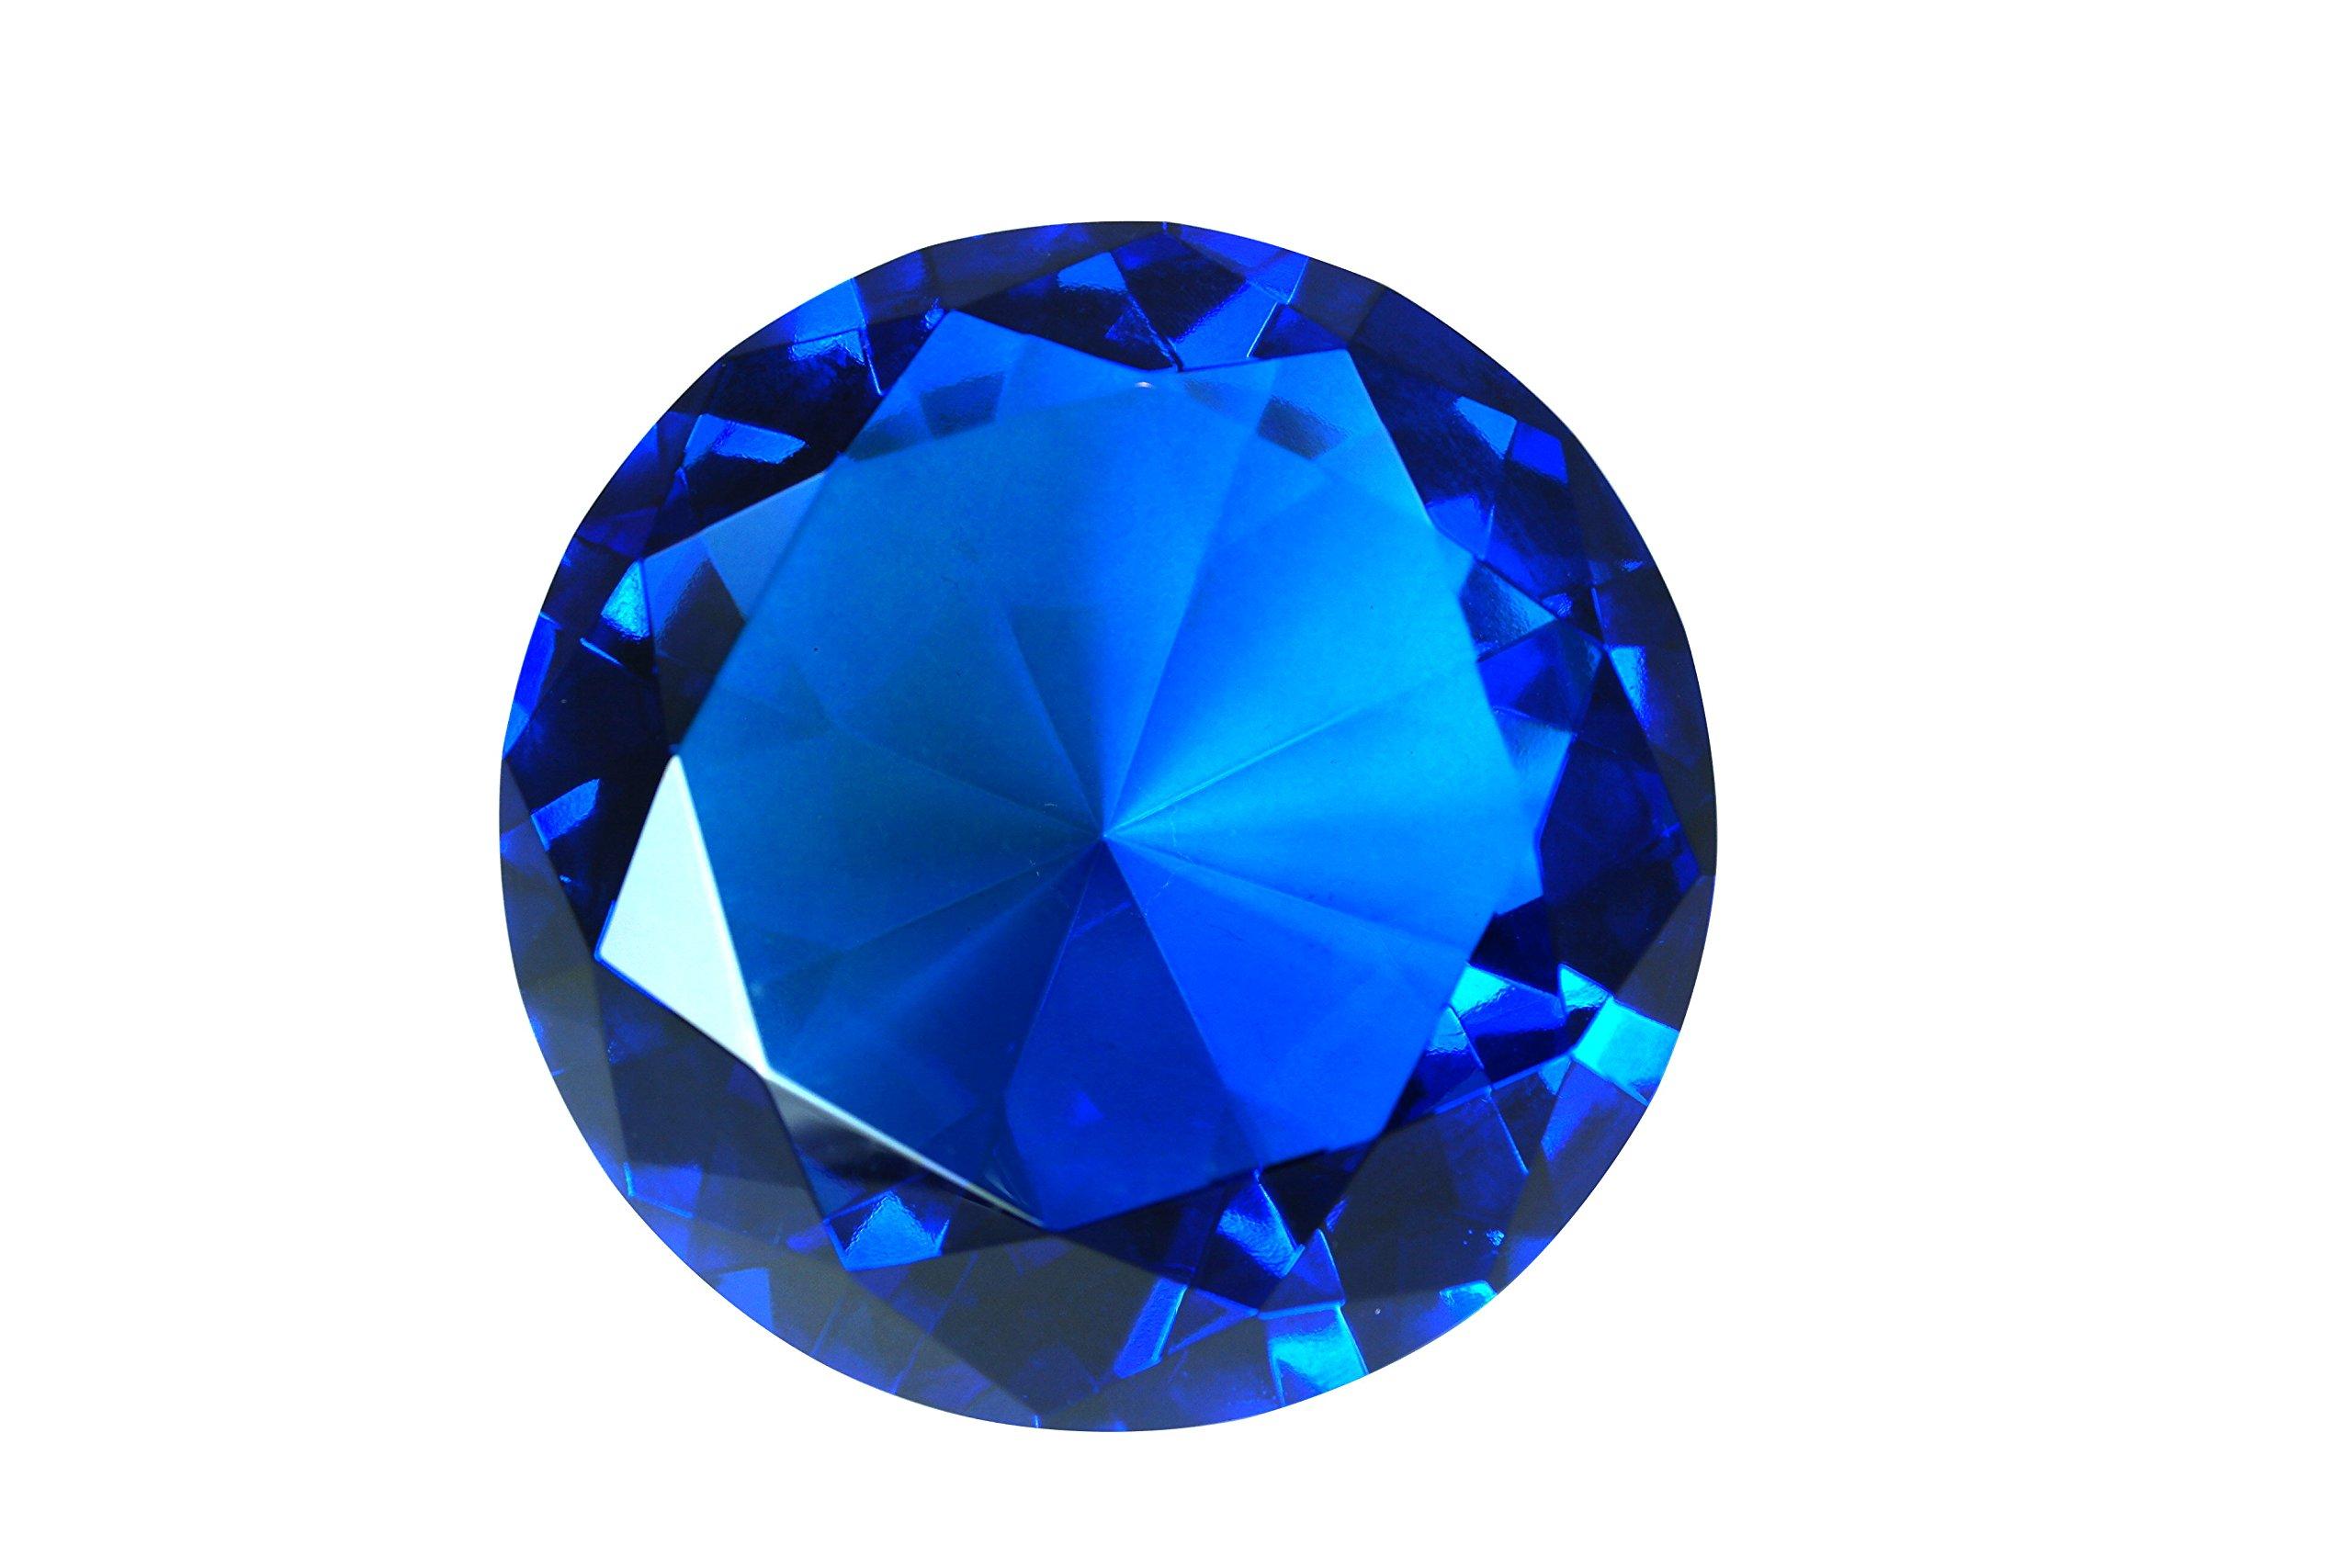 100mm Sapphire Blue Crystal Diamond Jewel Paperweight 4 Inch Tripact